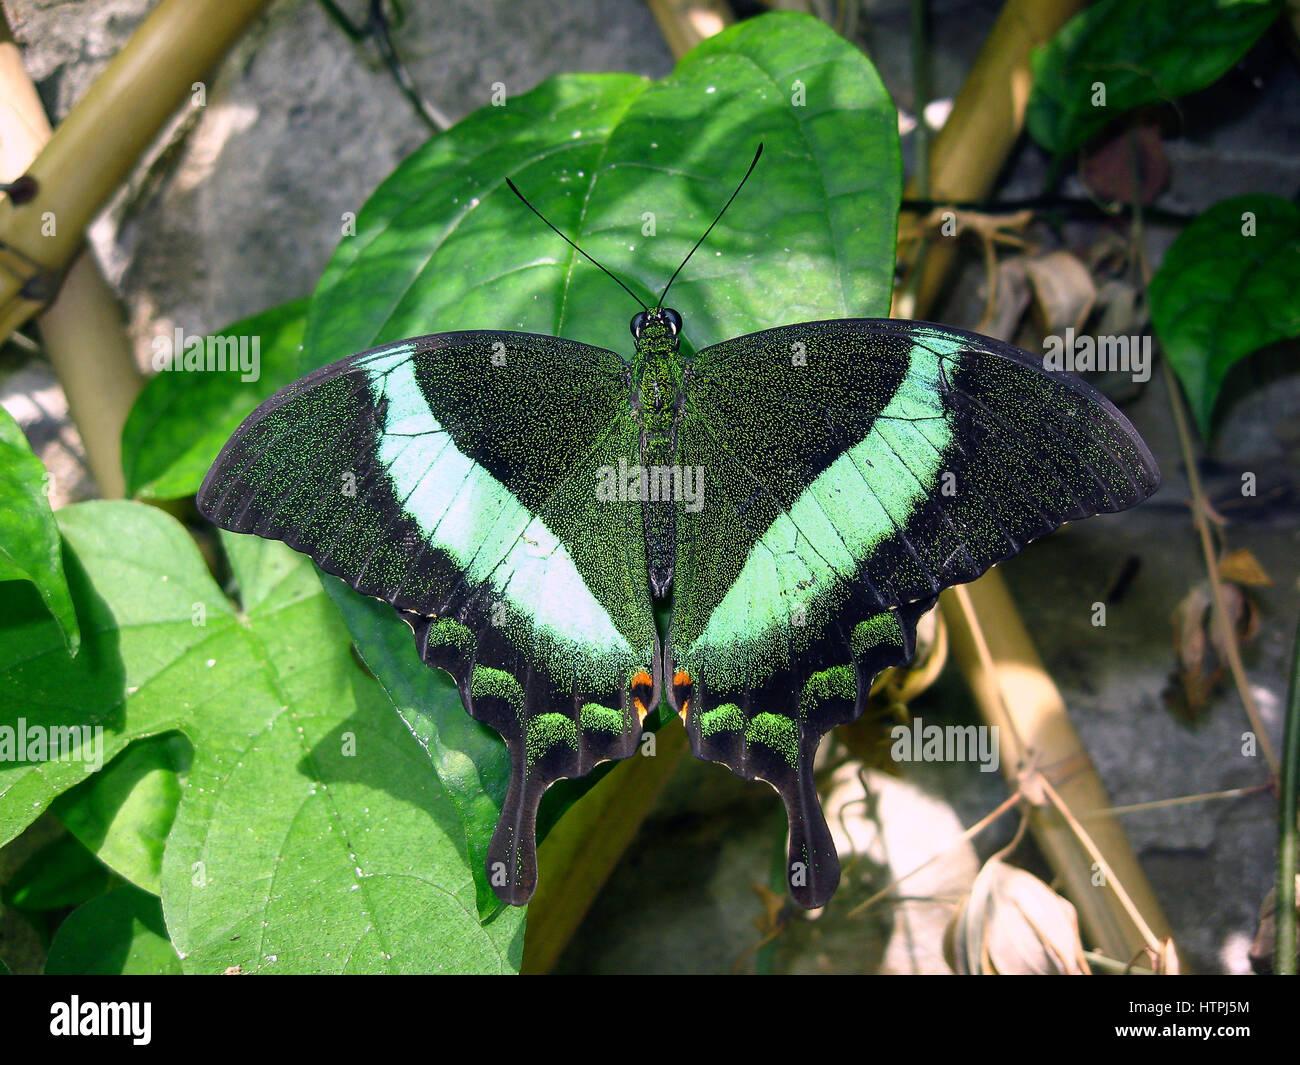 Reino: Animalia Phylum: Arthropoda Class: Insecta Lepidoptera Orden: Familia: Papilionidae Género:Papilio especies Foto de stock